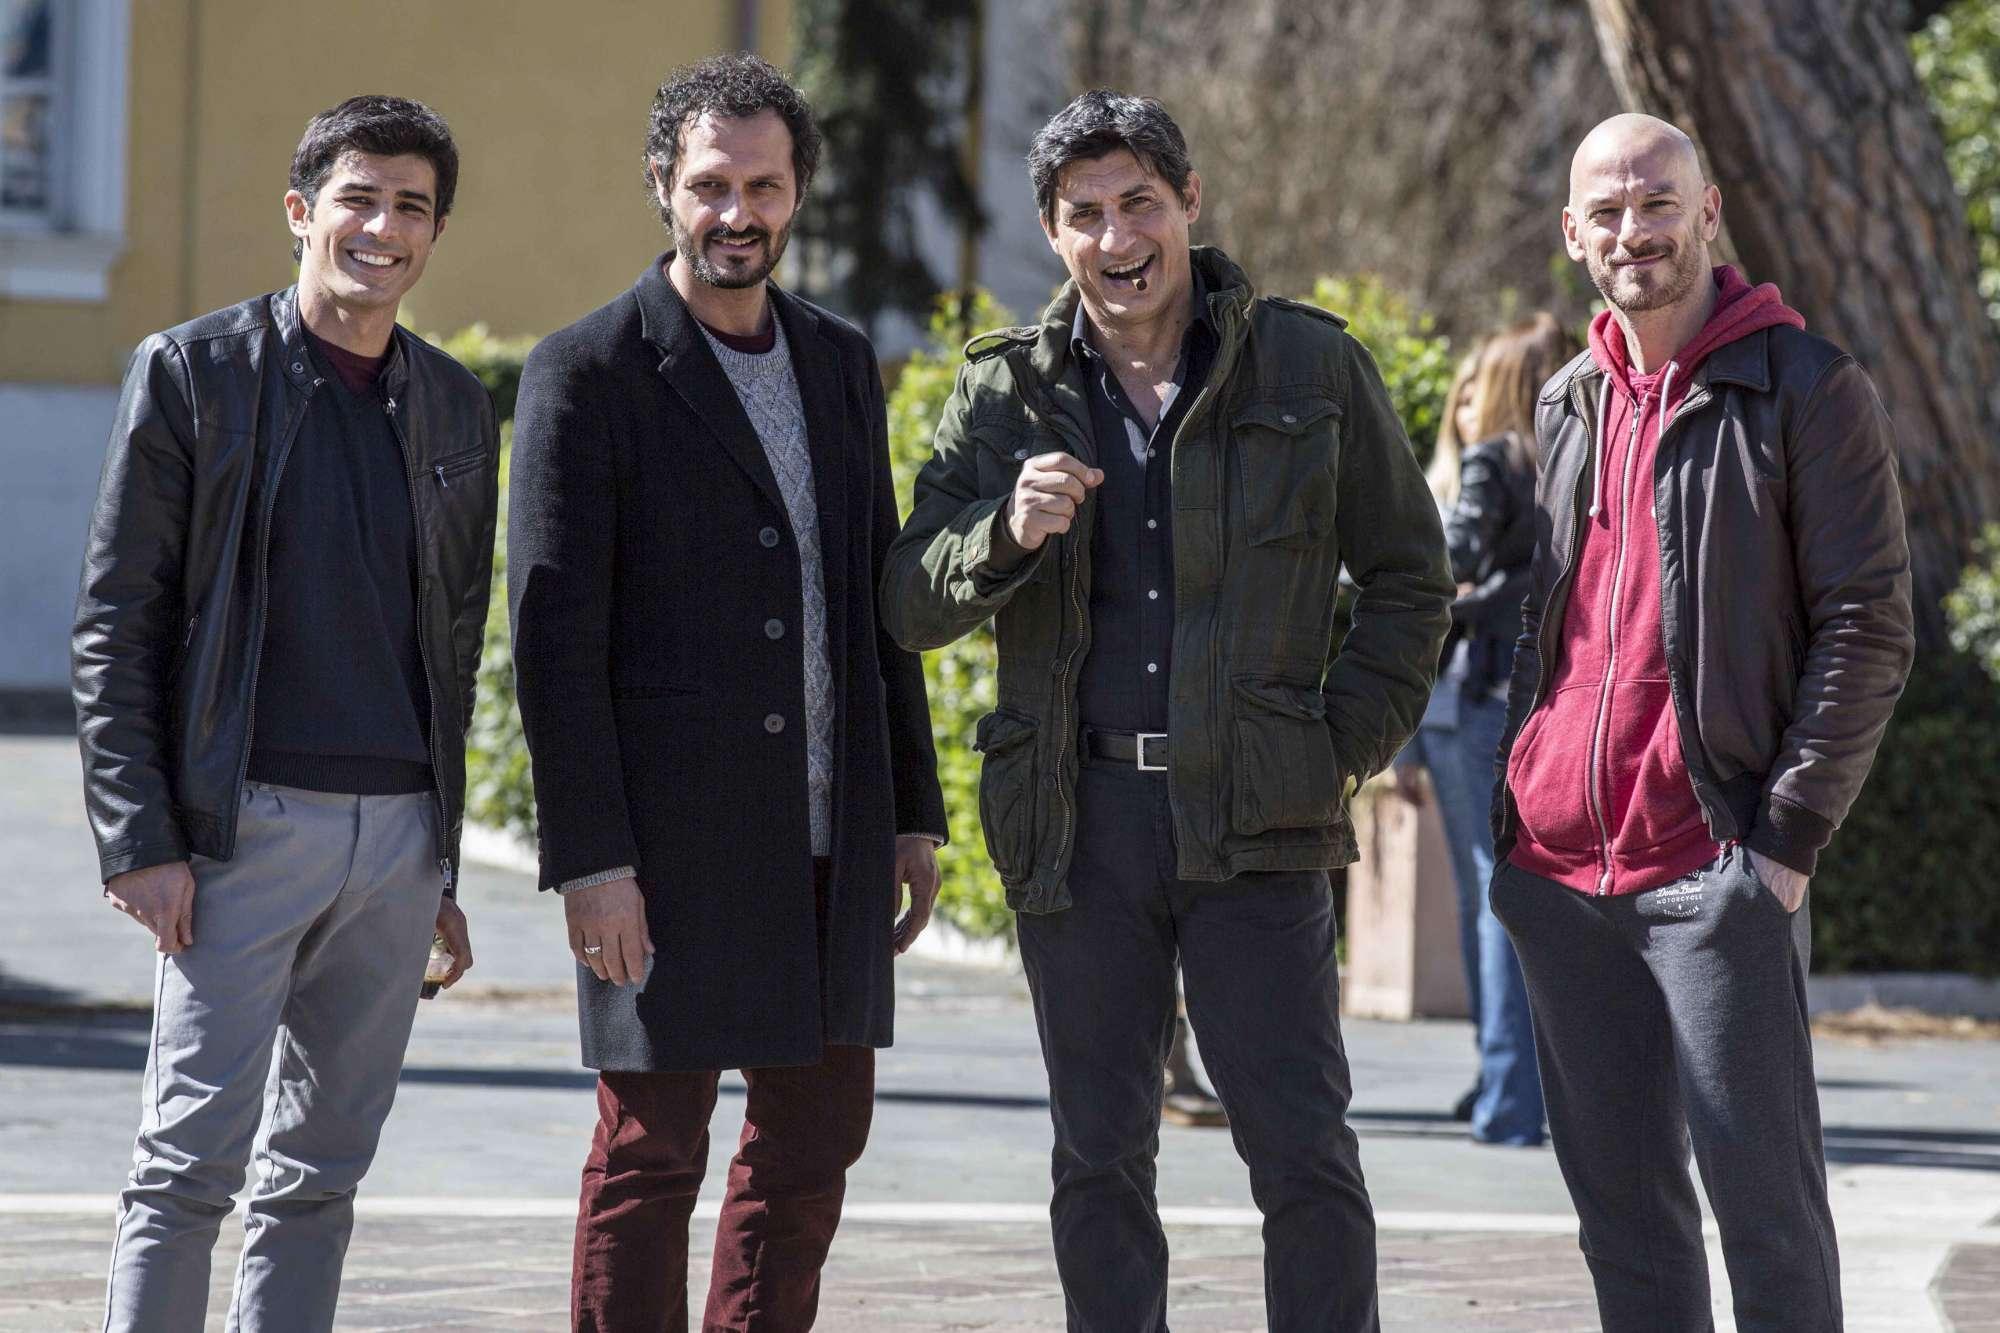 AMORE PENSACI TU SECONDA PUNTATA CANALE 5